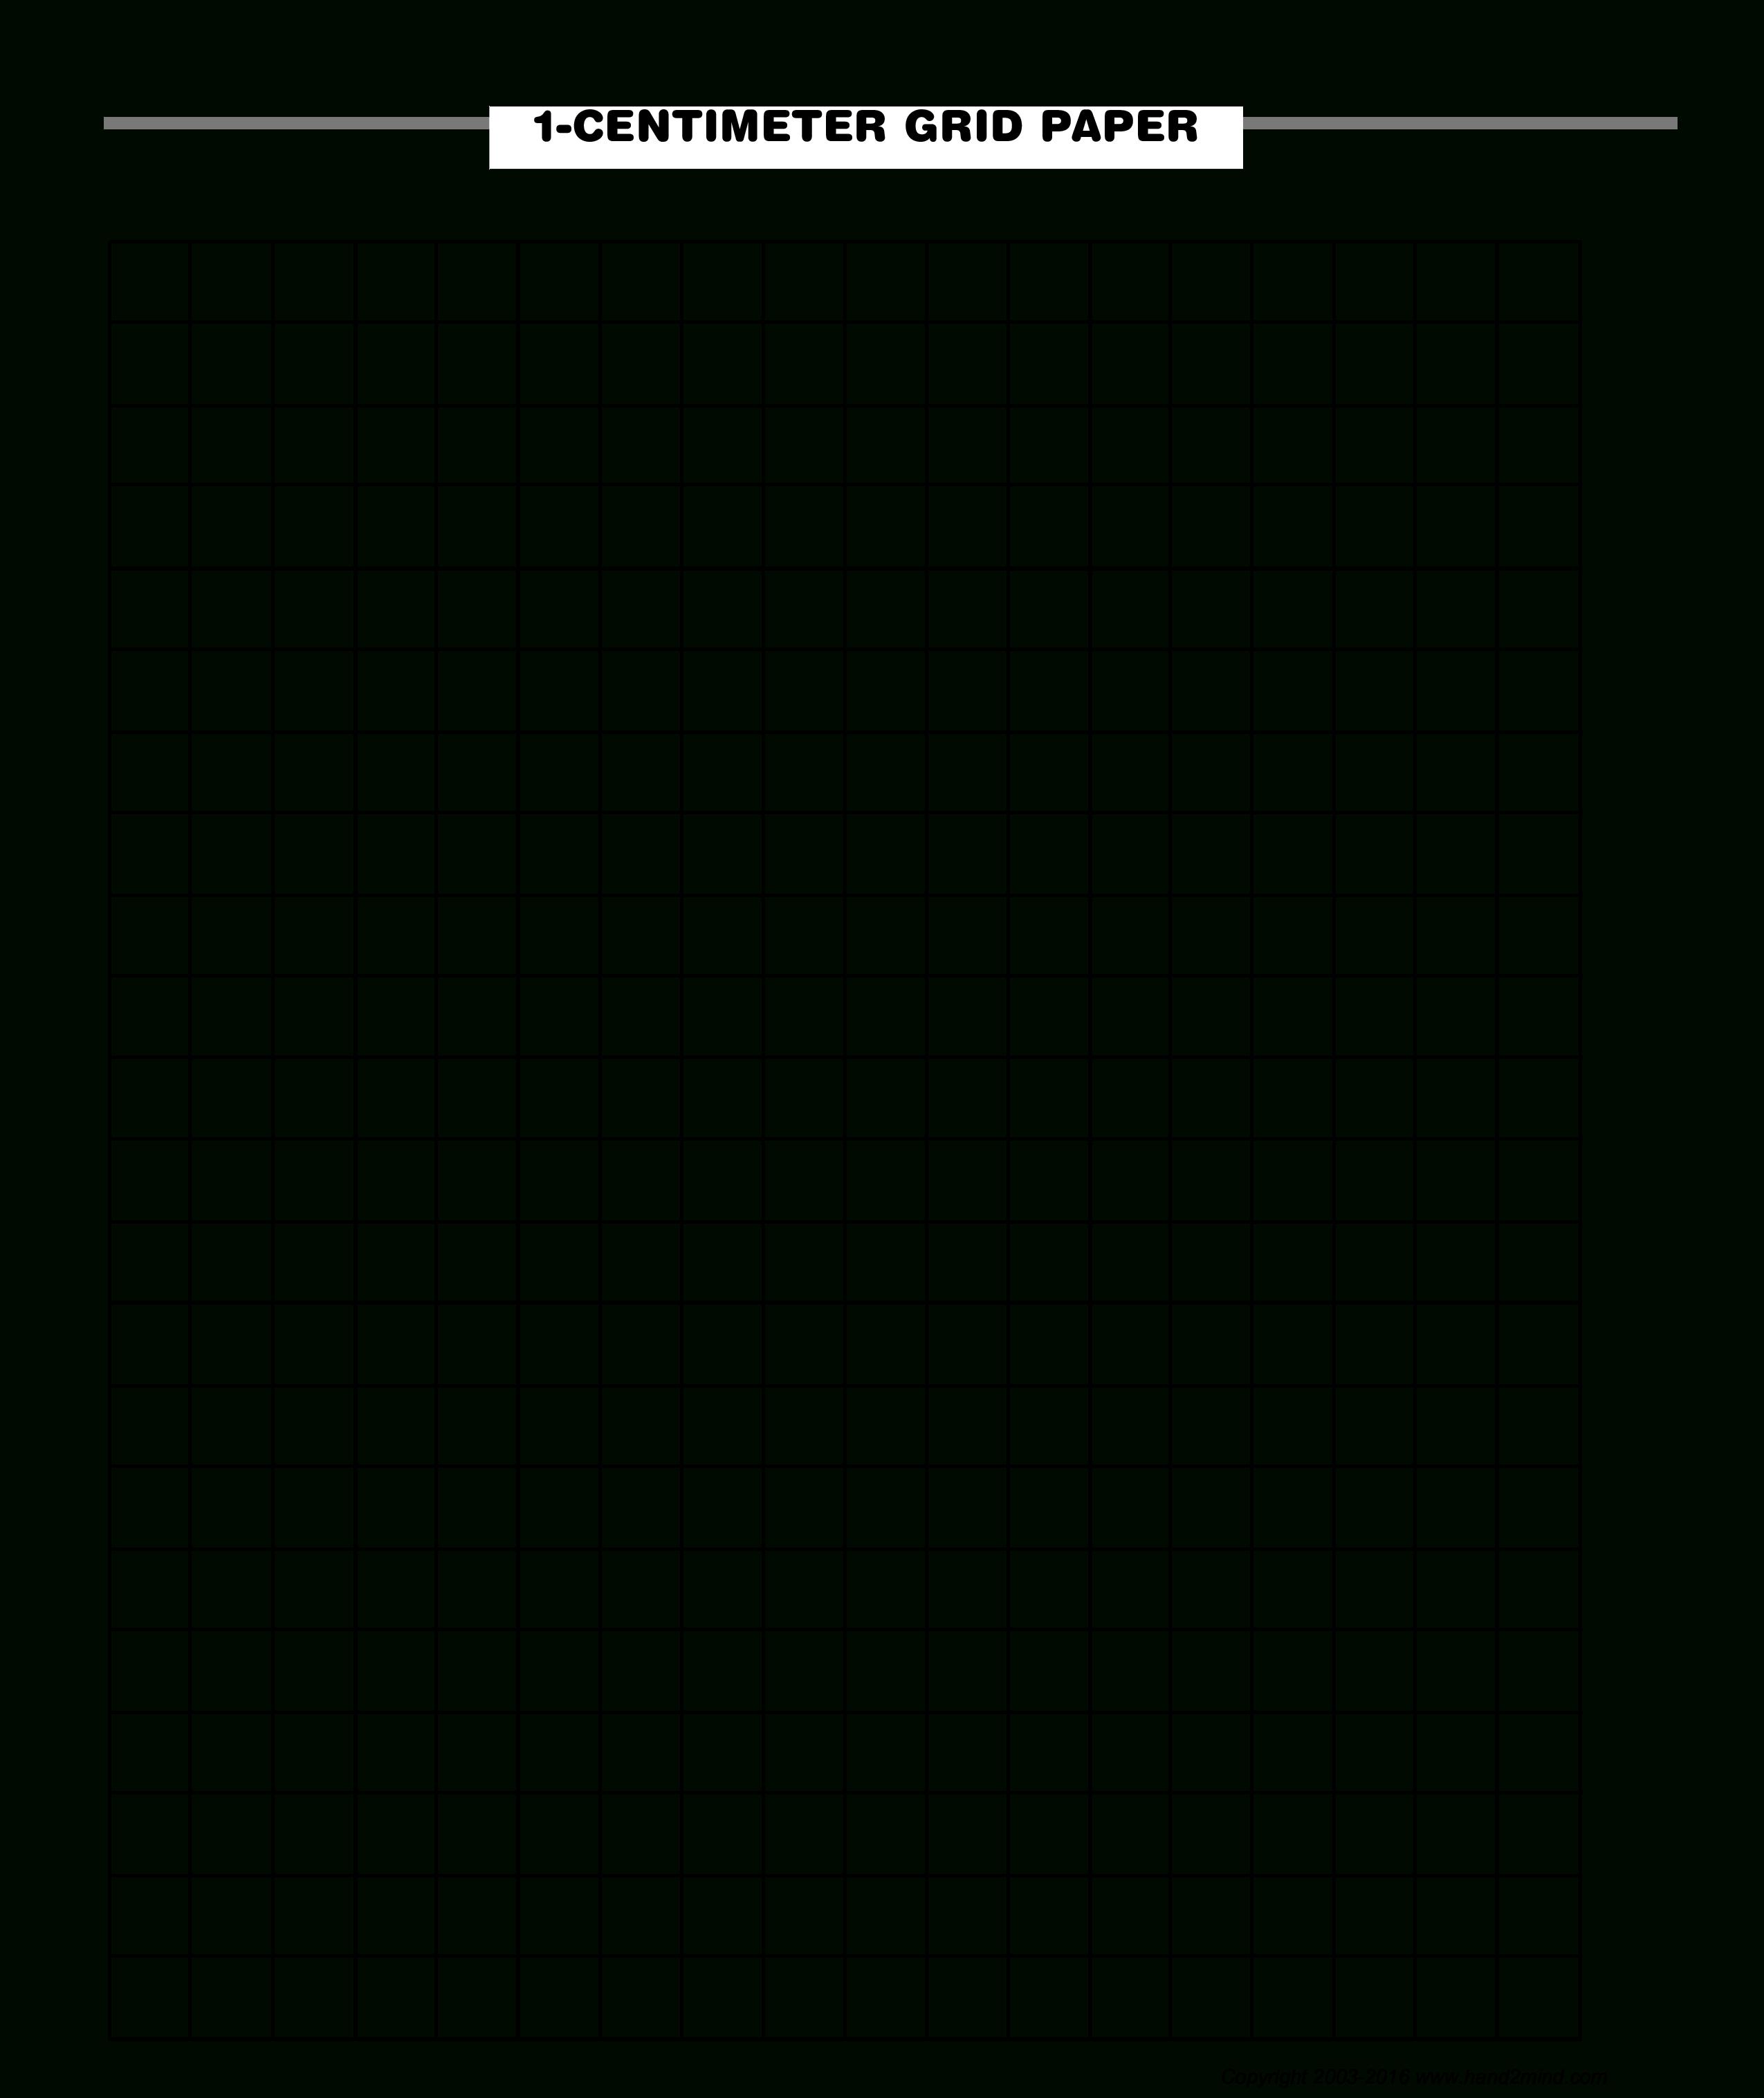 0DD83 Free Paper Templates | Wiring Resources on internet of things diagrams, sincgars radio configurations diagrams, friendship bracelet diagrams, pinout diagrams, led circuit diagrams, motor diagrams, honda motorcycle repair diagrams, engine diagrams, switch diagrams, electrical diagrams, transformer diagrams, hvac diagrams, electronic circuit diagrams, battery diagrams, gmc fuse box diagrams, lighting diagrams, troubleshooting diagrams, series and parallel circuits diagrams, smart car diagrams,